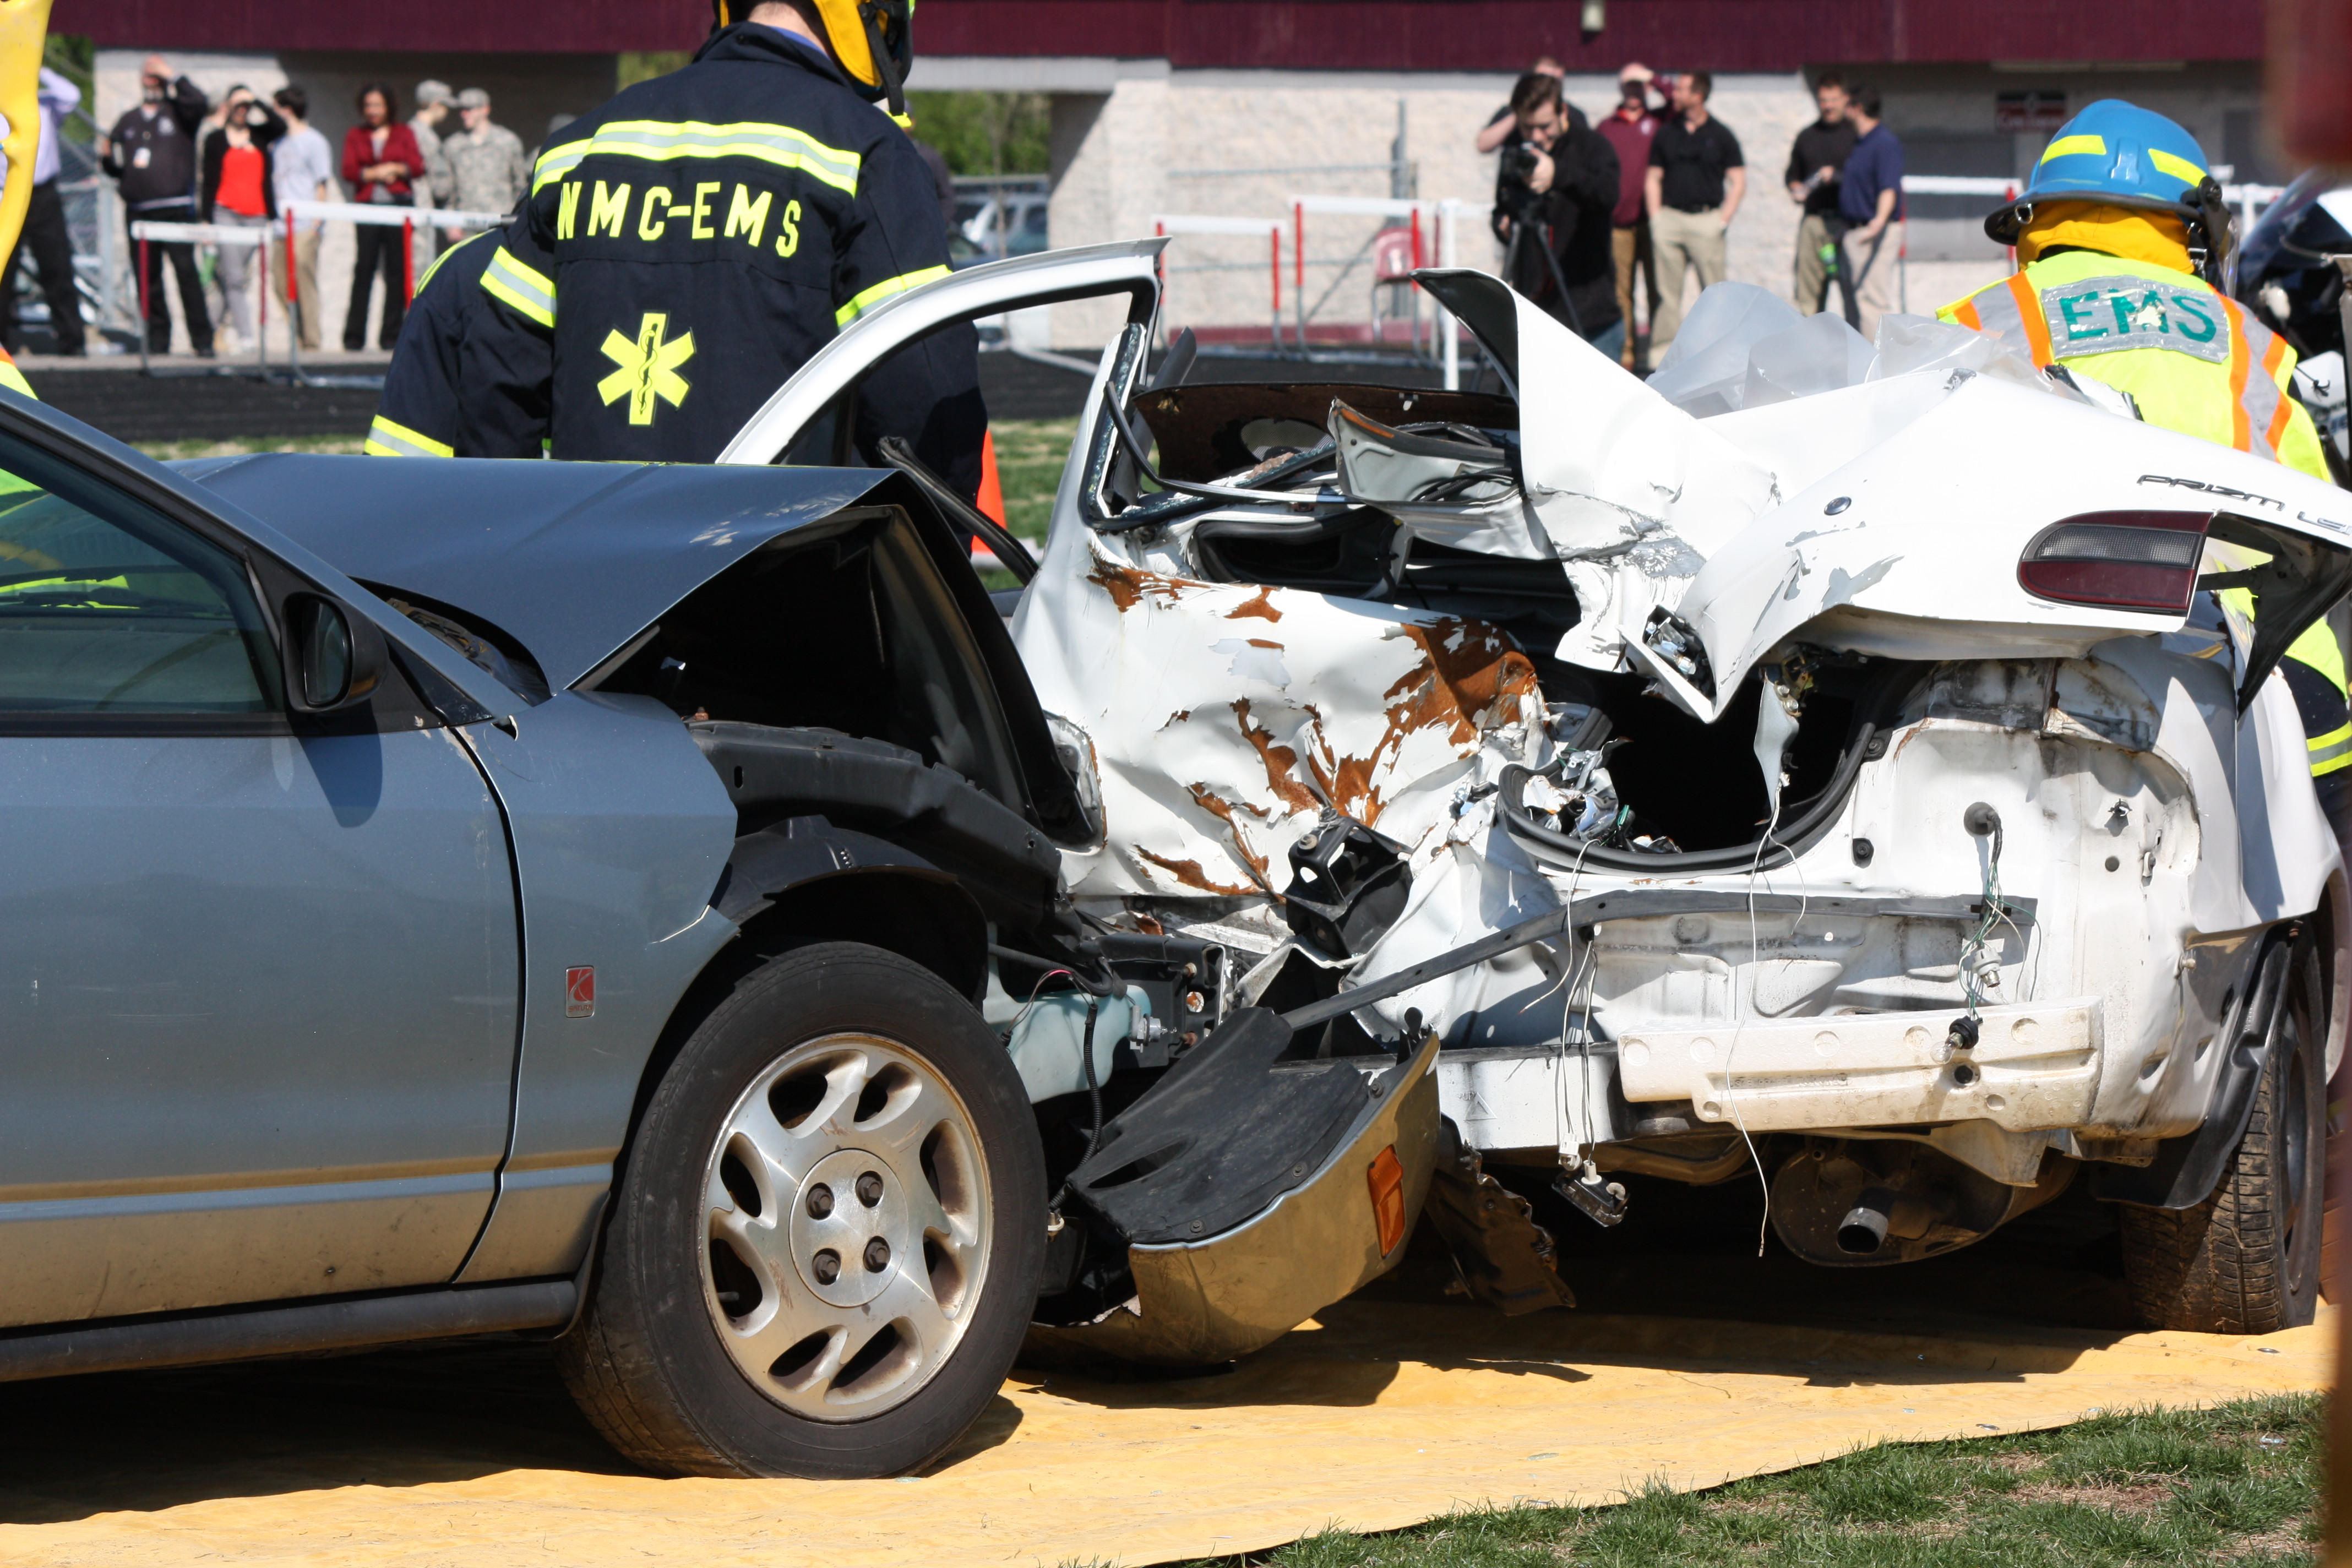 Ems franklin police news for Ford motor credit franklin tn